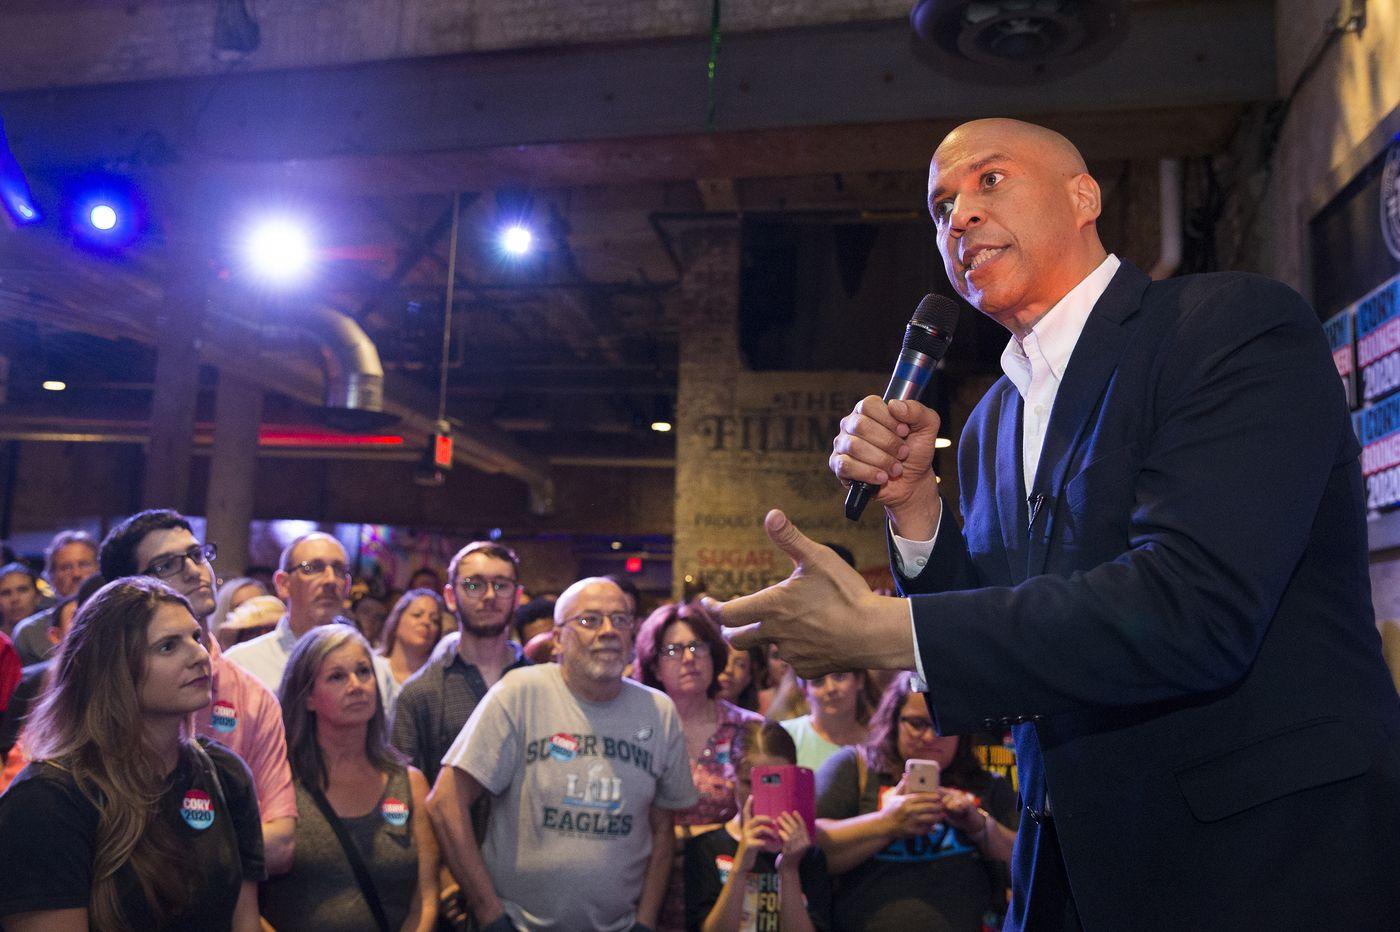 As Trump visits El Paso and Dayton, Cory Booker, Joe Biden blast him for feeding white supremacy